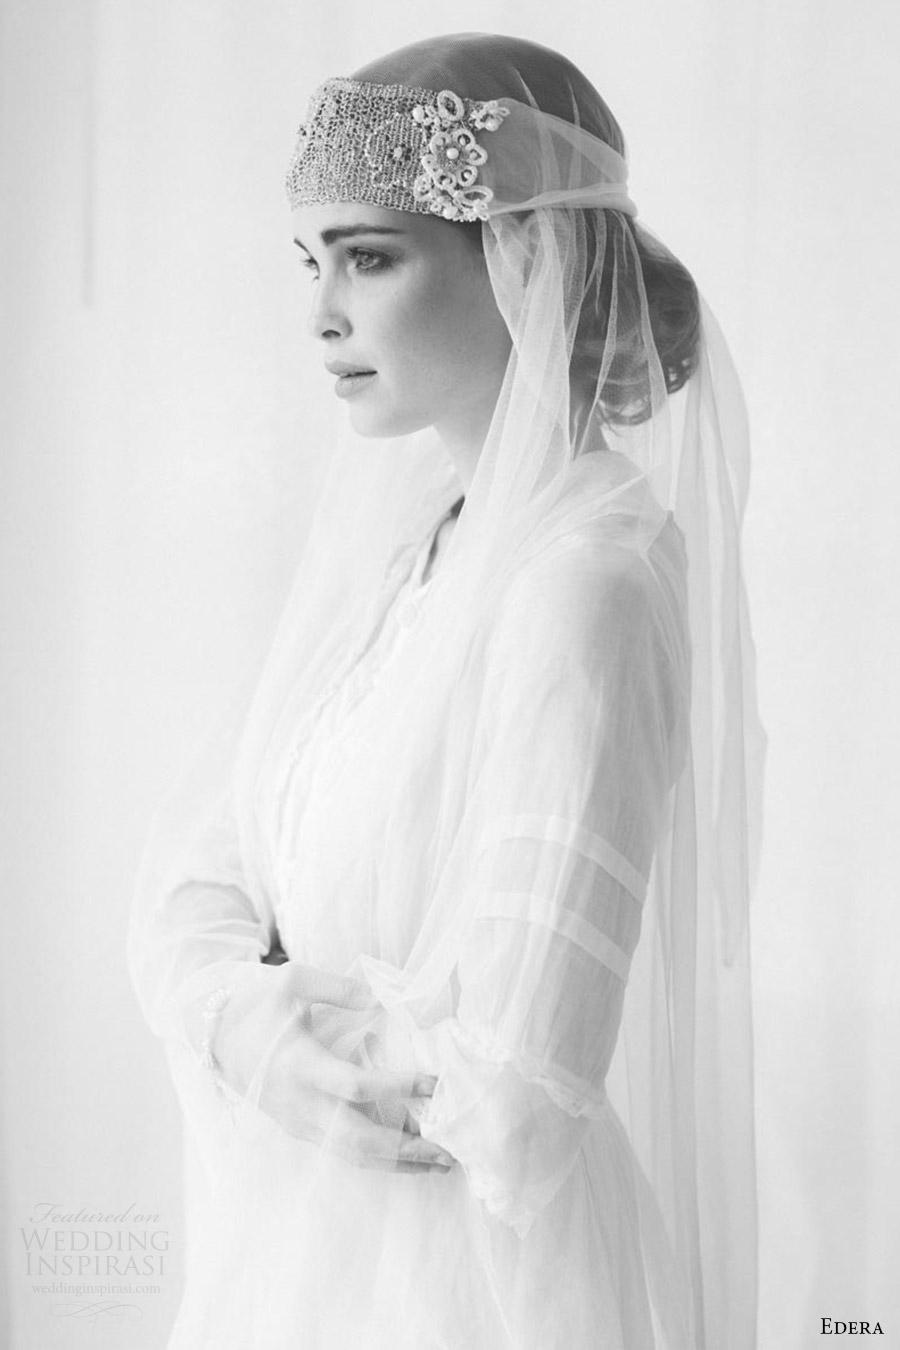 edera jewelry 2016 bridal accessories collection aquarelle (camille) bandeau headband sv bw